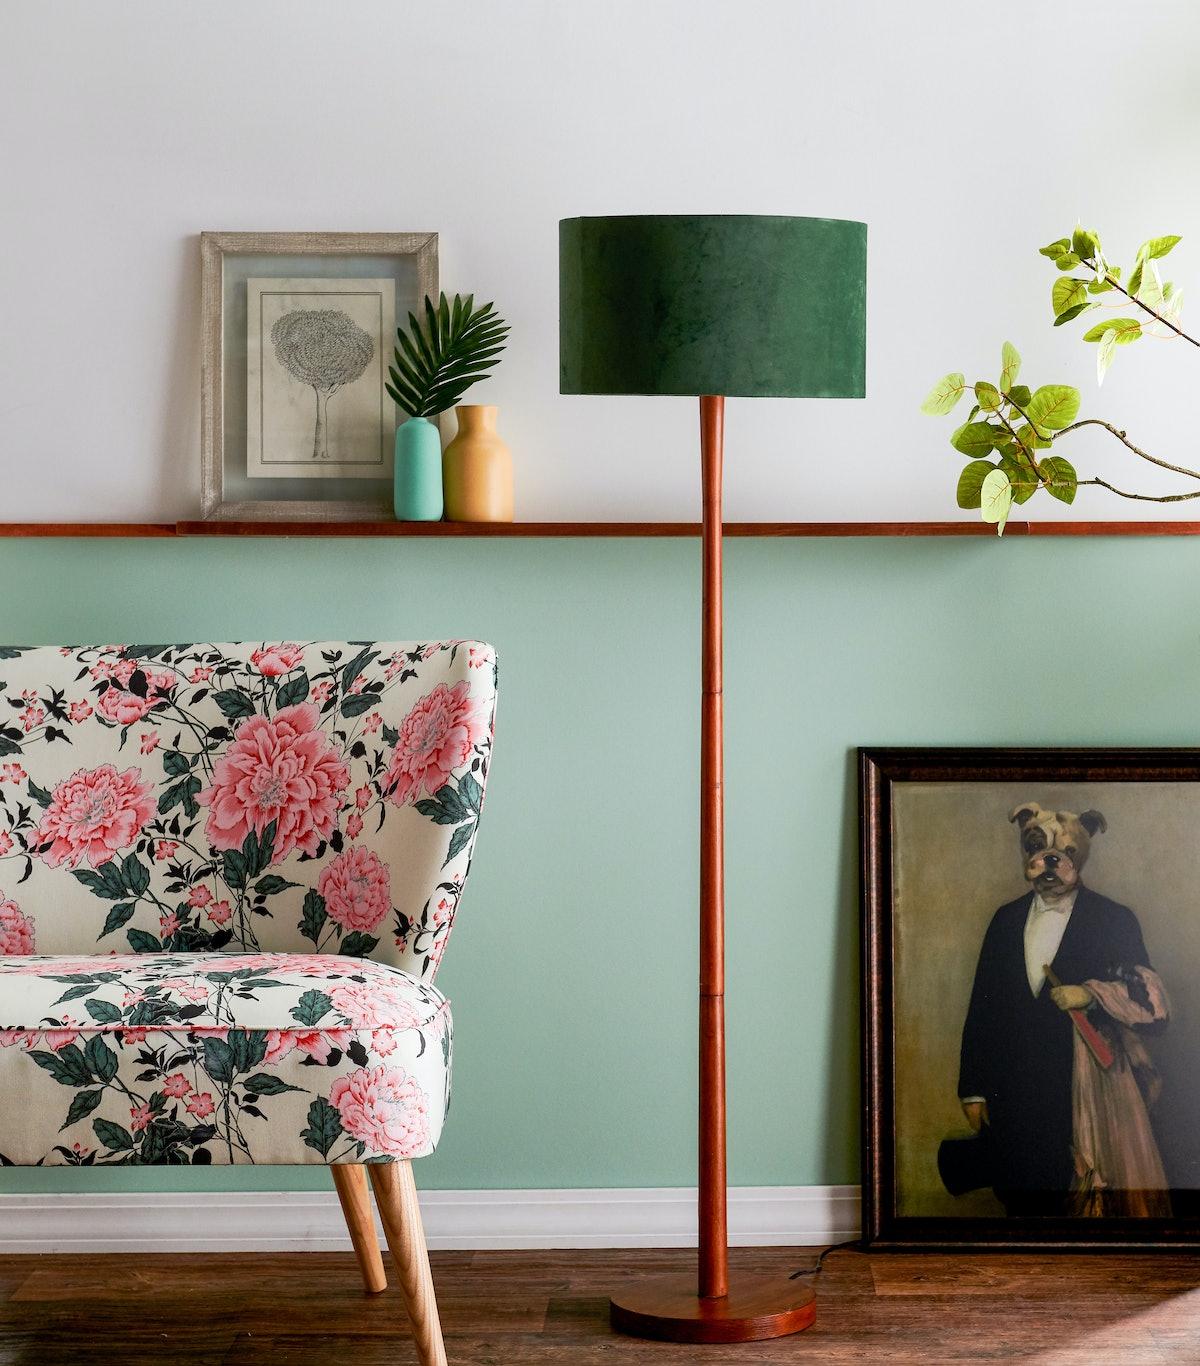 Wood Floor Lamp with Green Velvet Shade by Drew Barrymore Flower Home